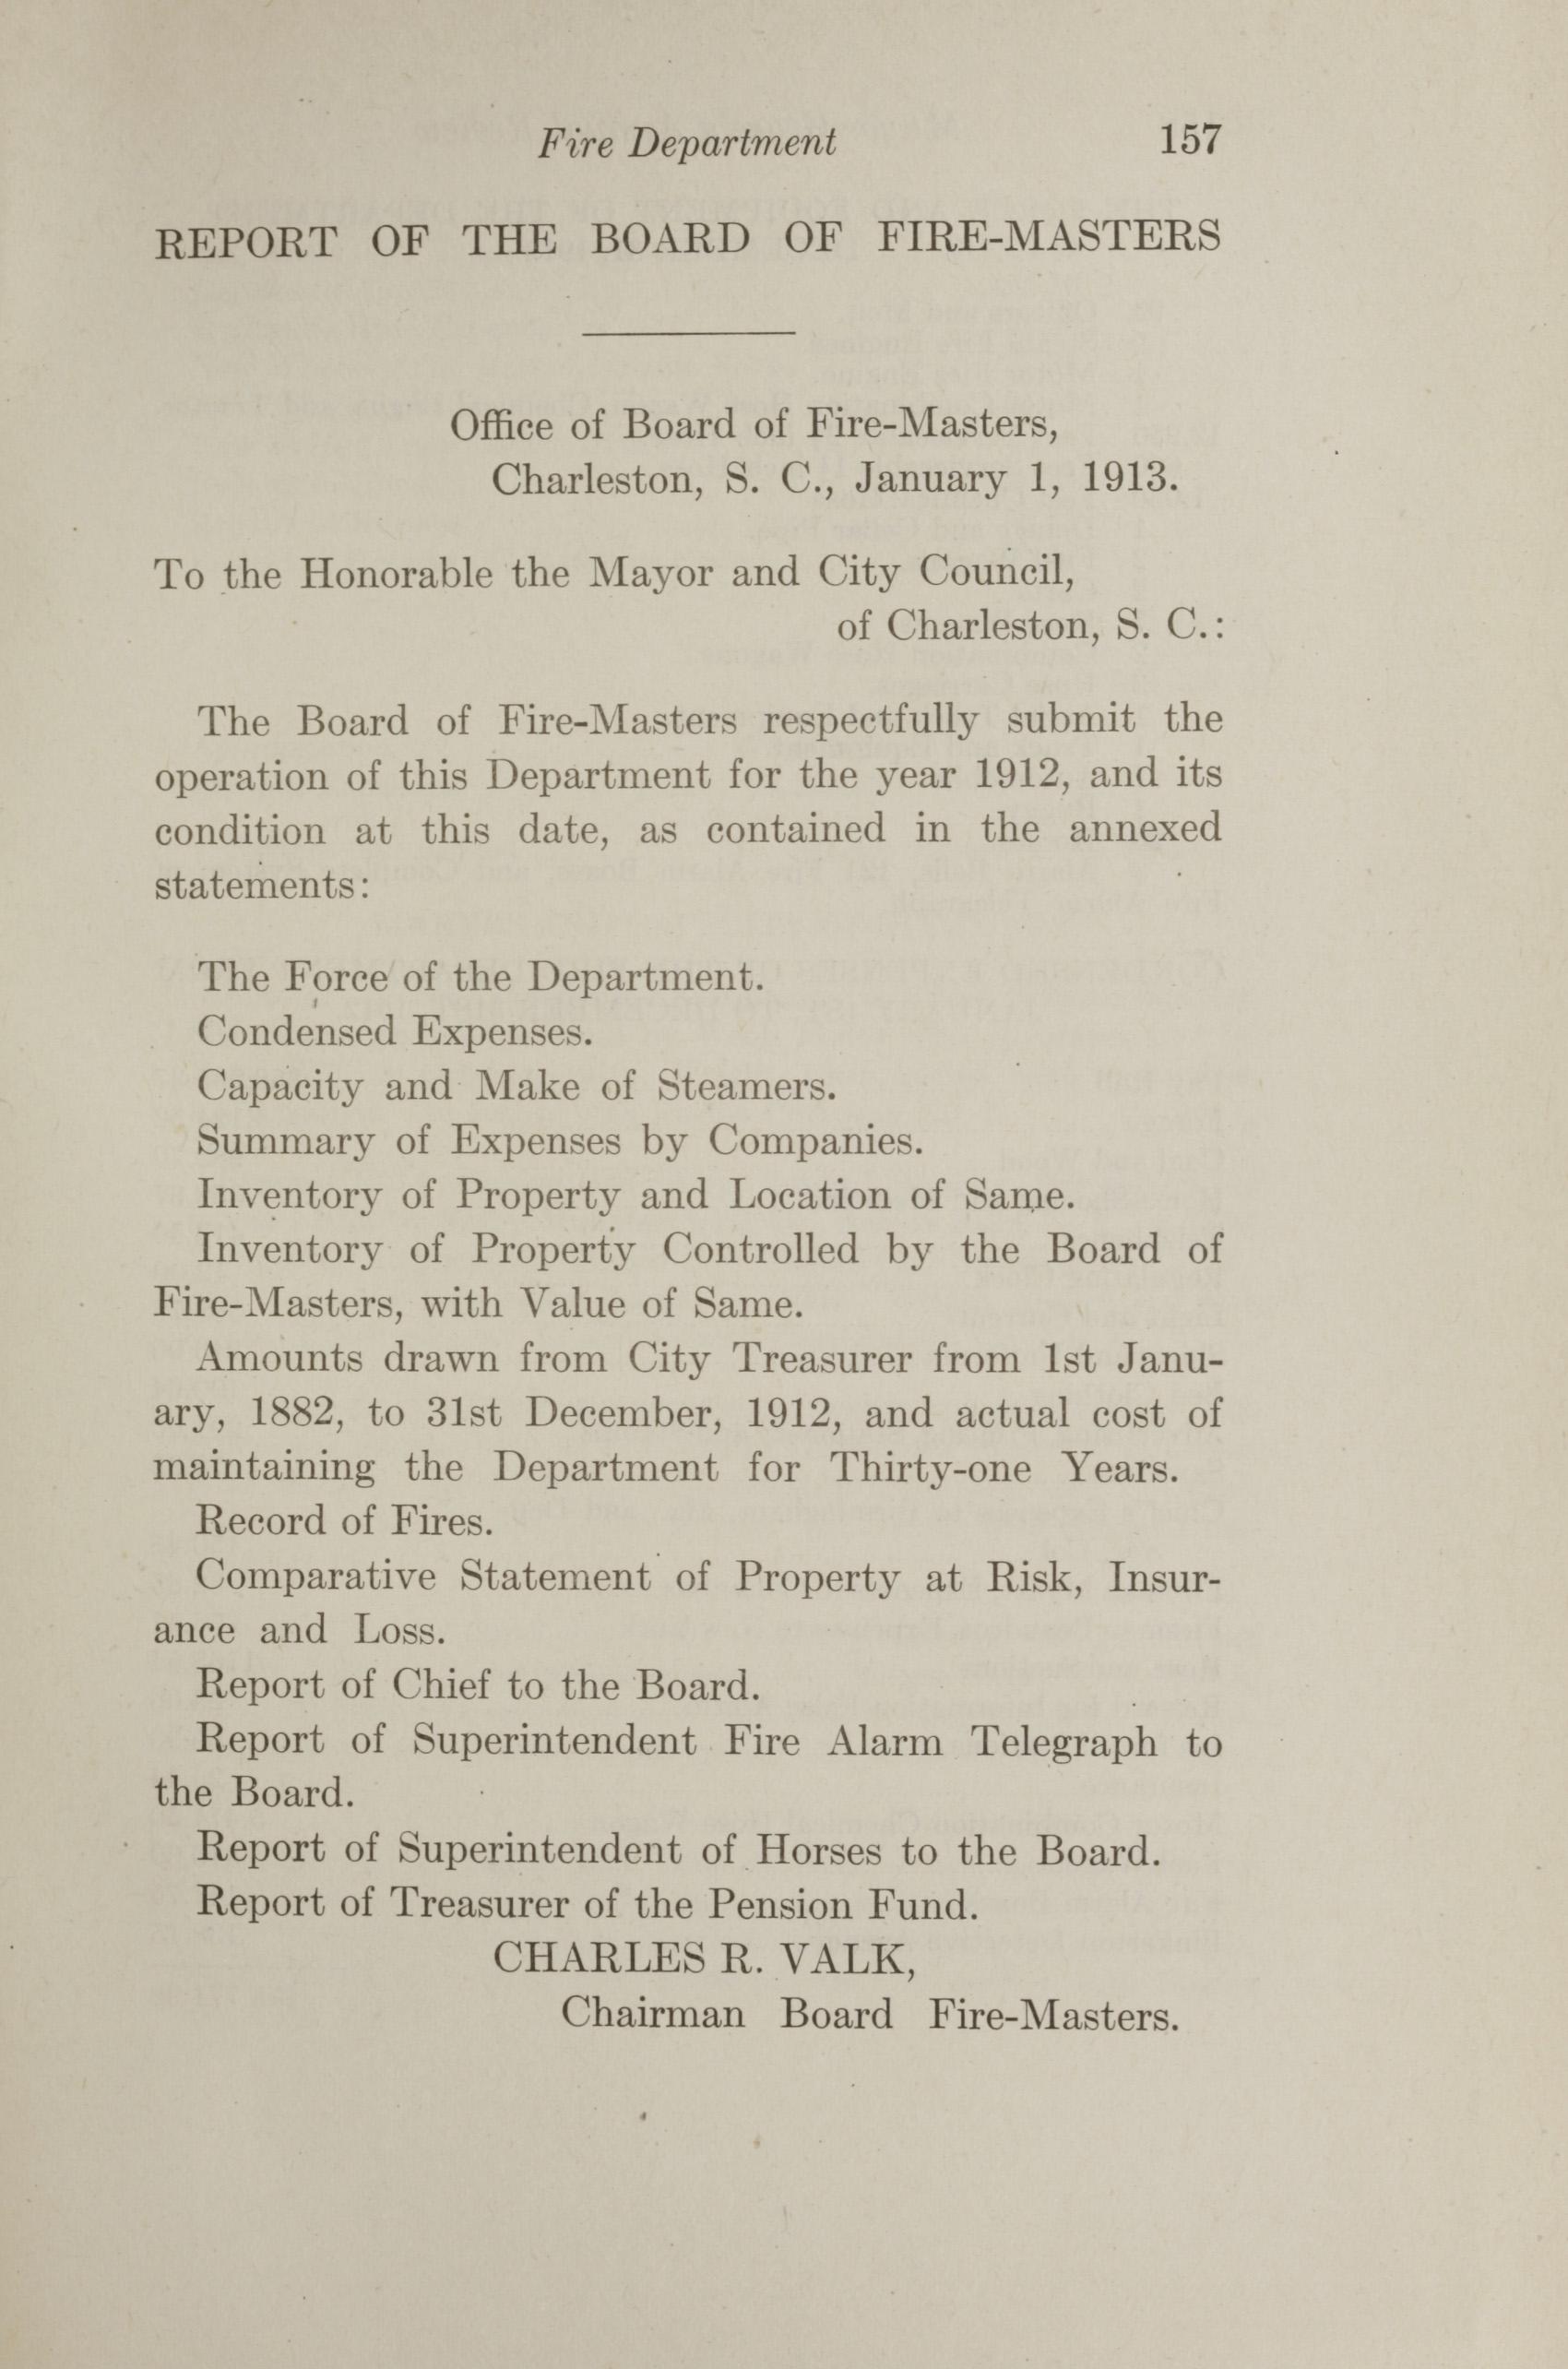 Charleston Yearbook, 1912, page 157